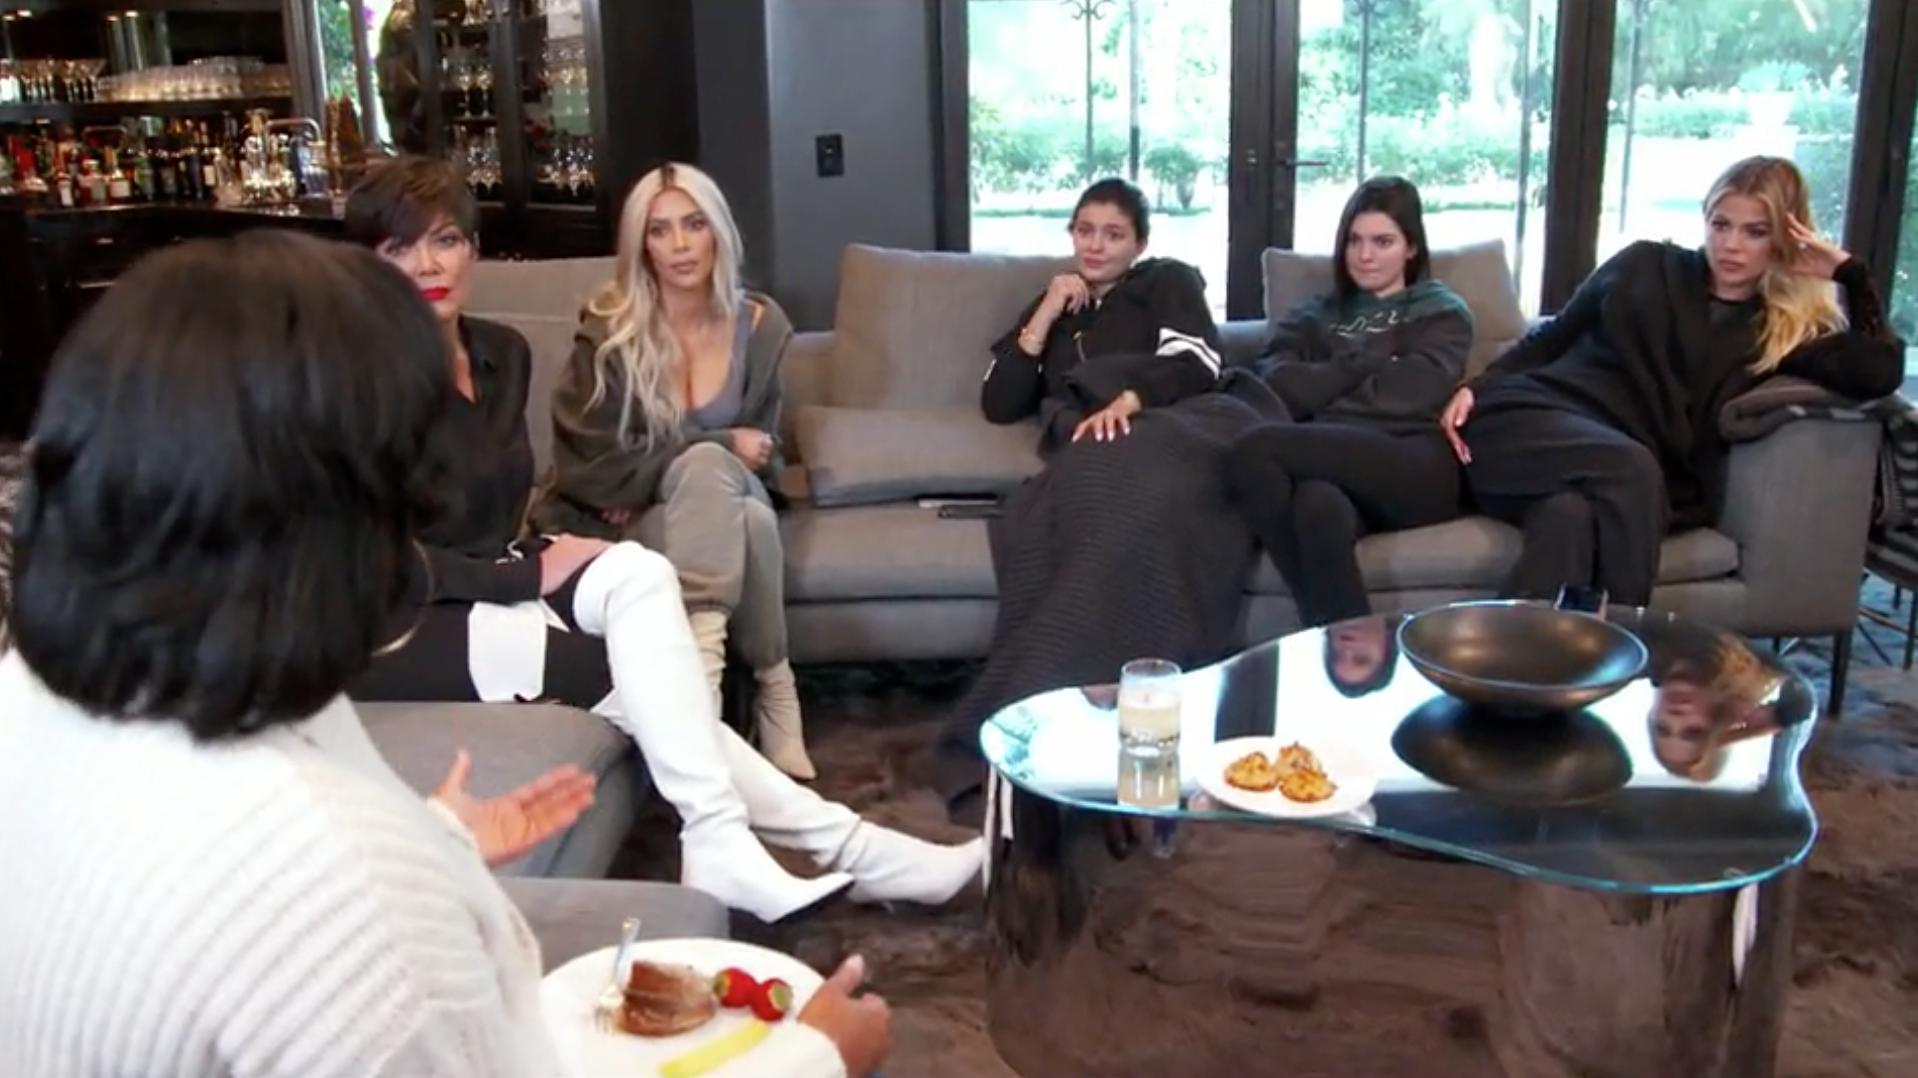 Kim K and family